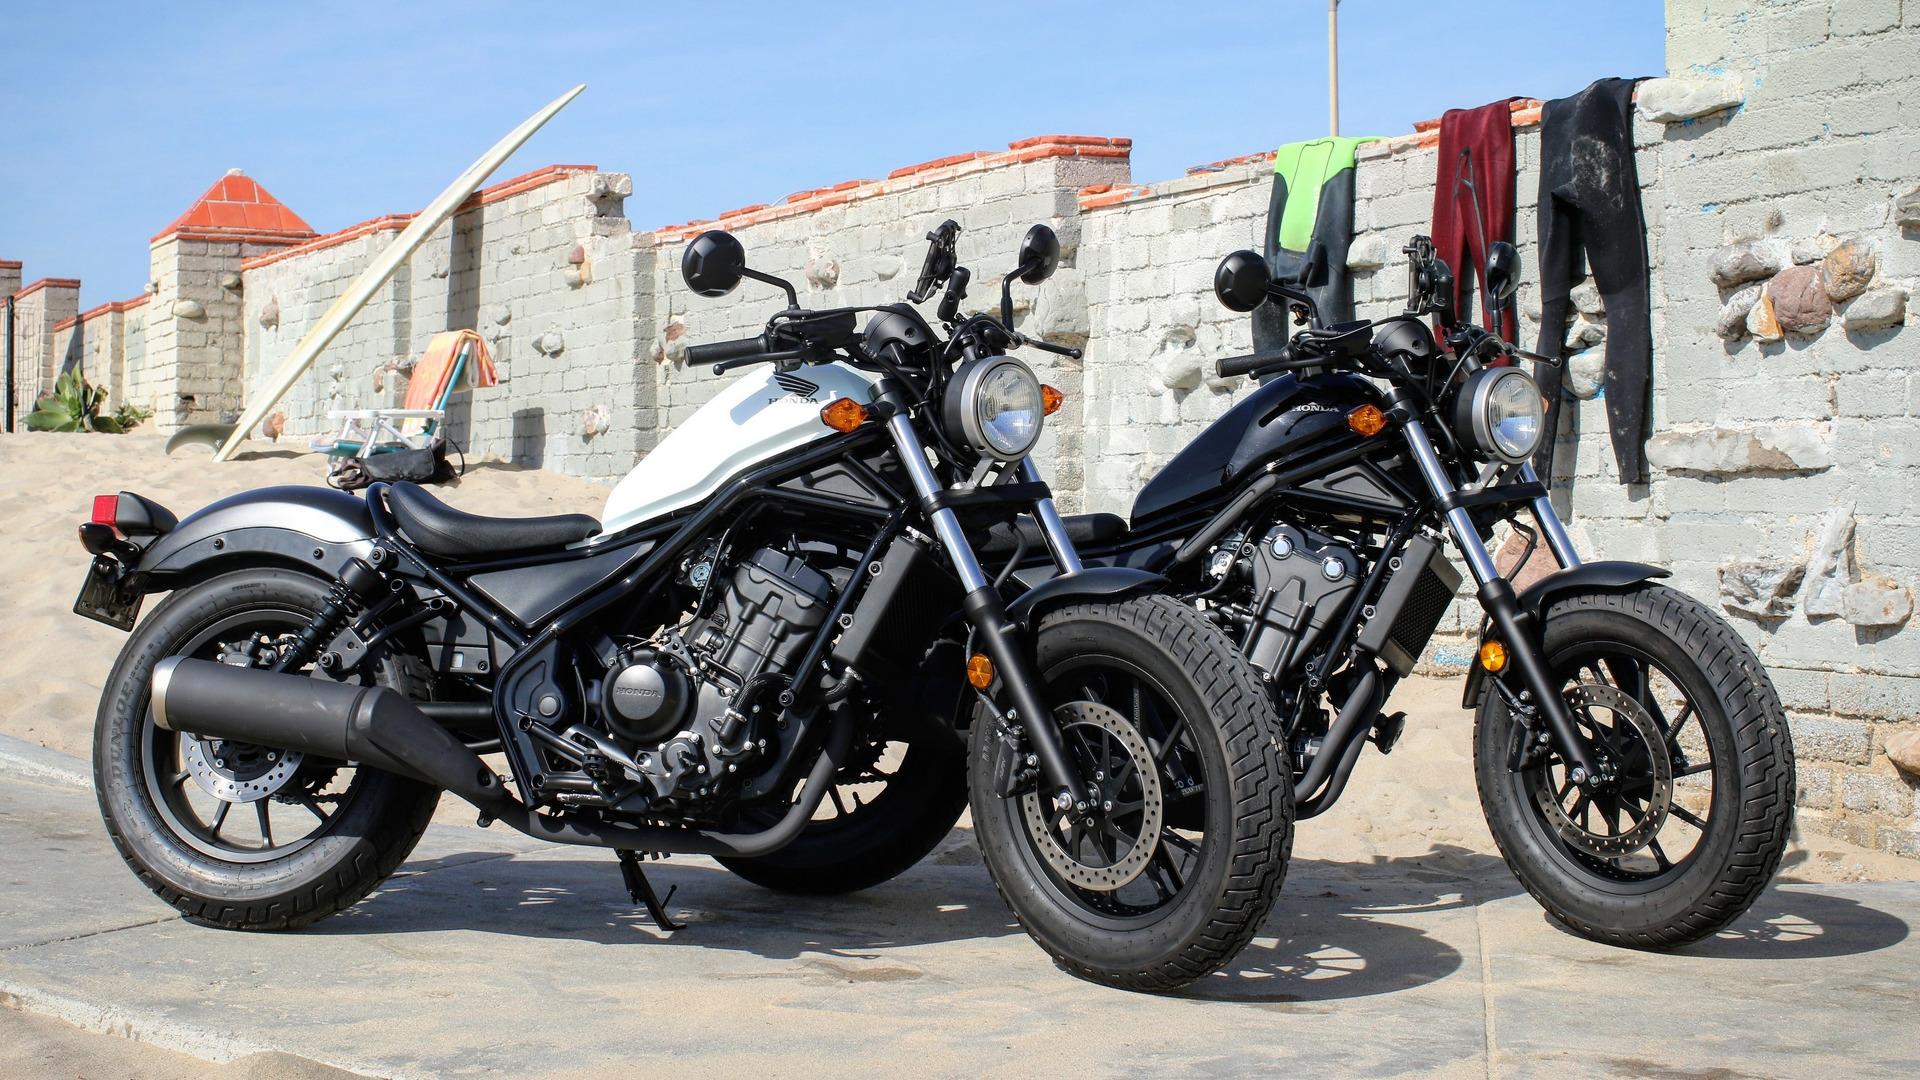 2018 honda rebel. plain rebel 2018 honda rebel 300 first look der motorfiets first ride 2017 honda rebel  300500 throughout a